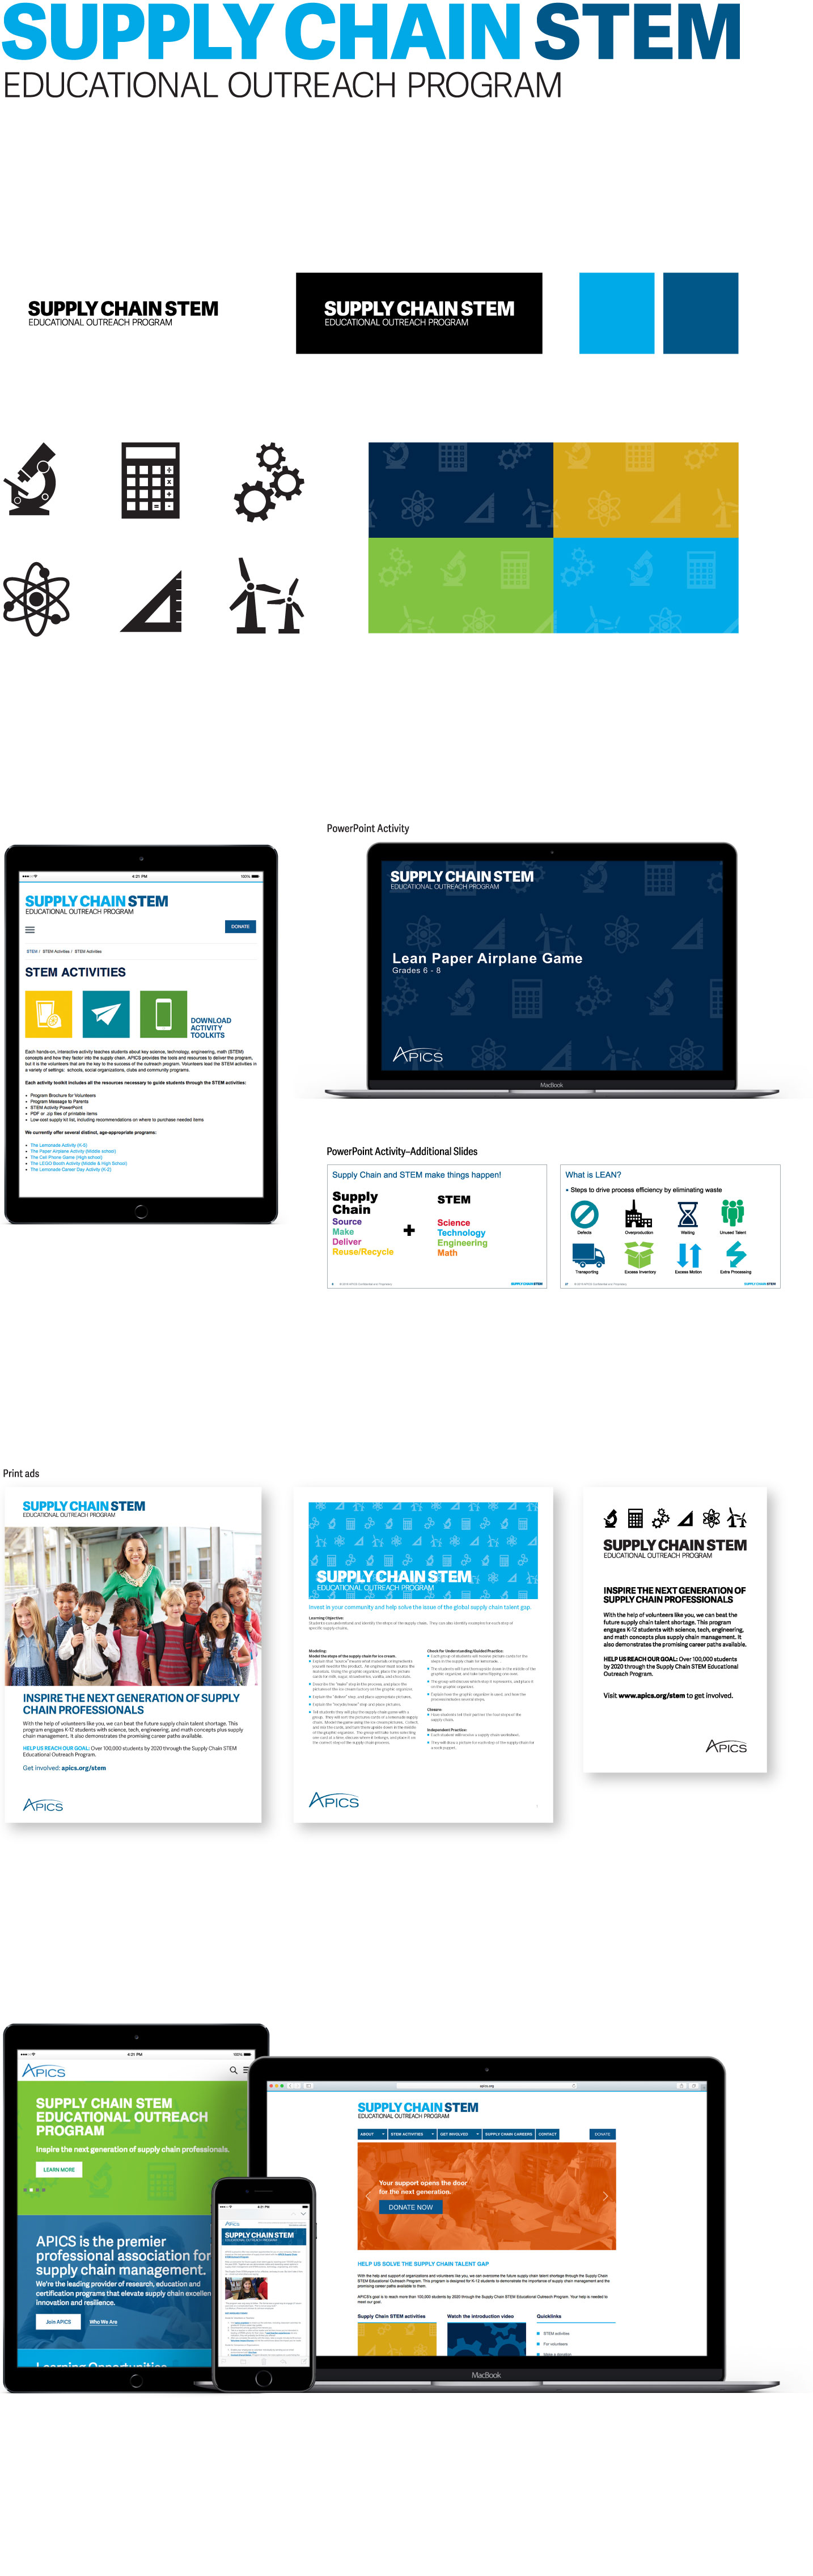 STEM_ss_brand_elements.jpg